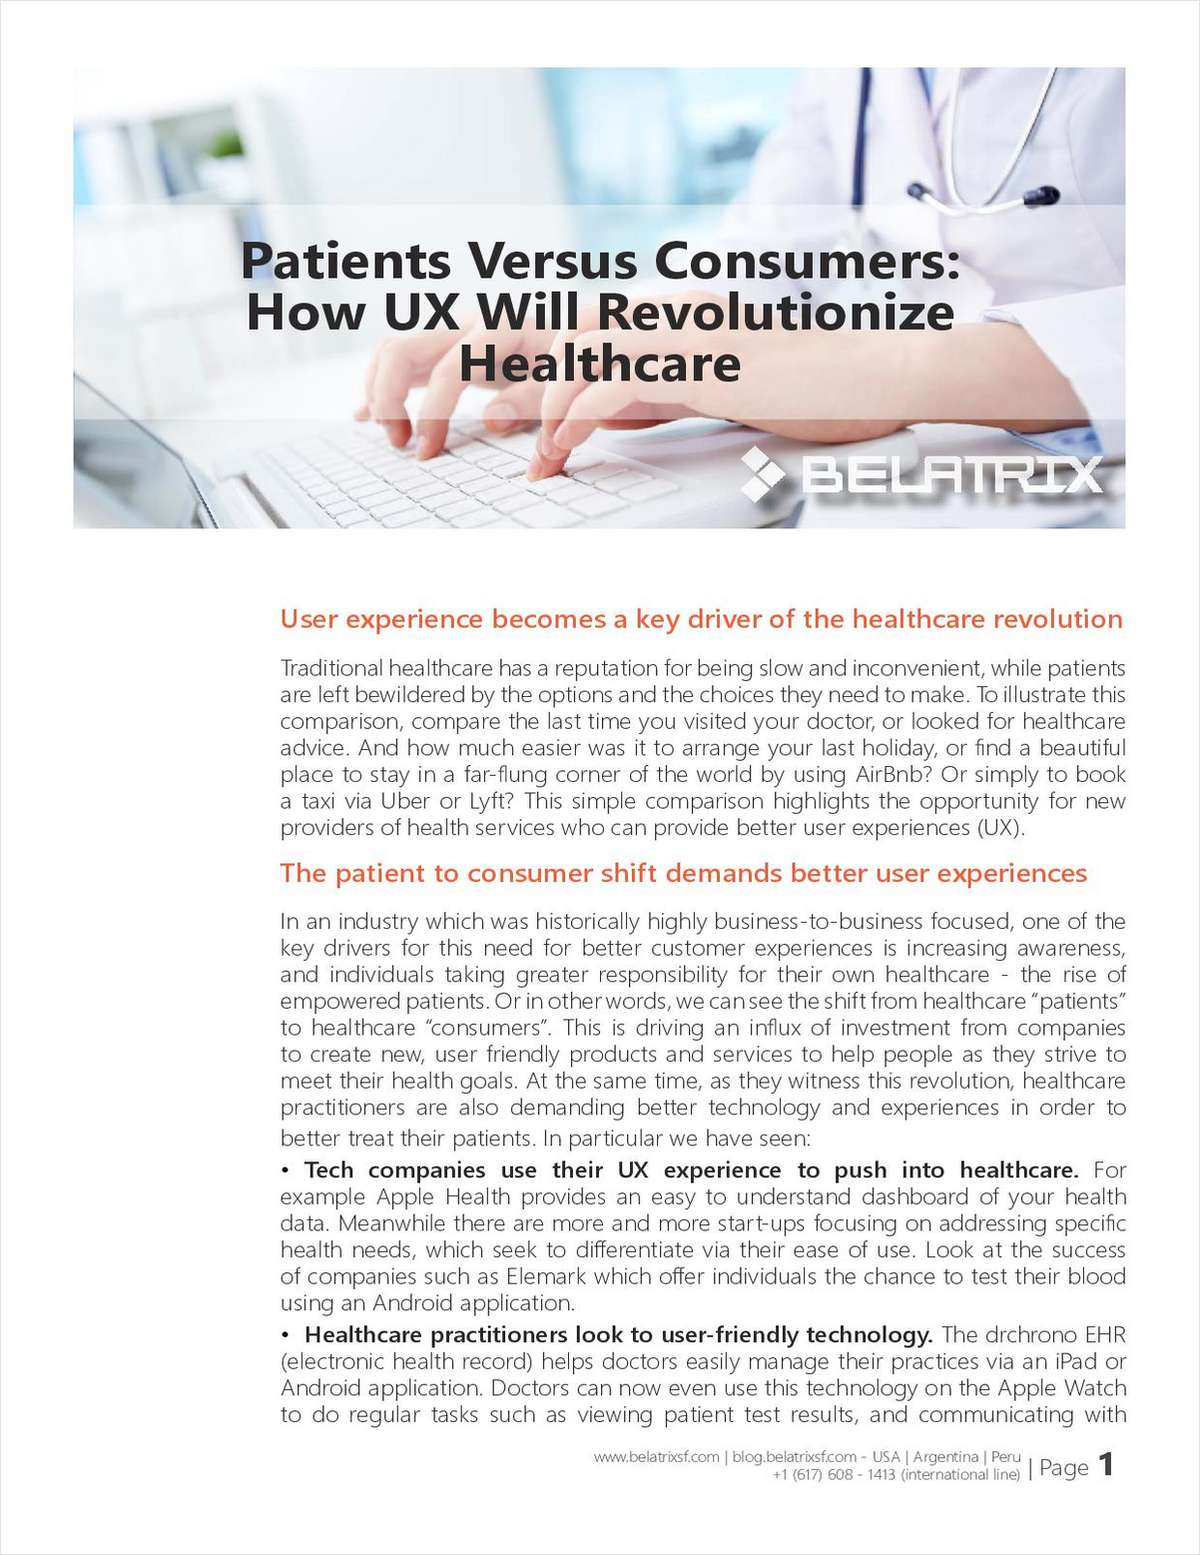 Patients Versus Consumers: How UX Will Revolutionize Healthcare